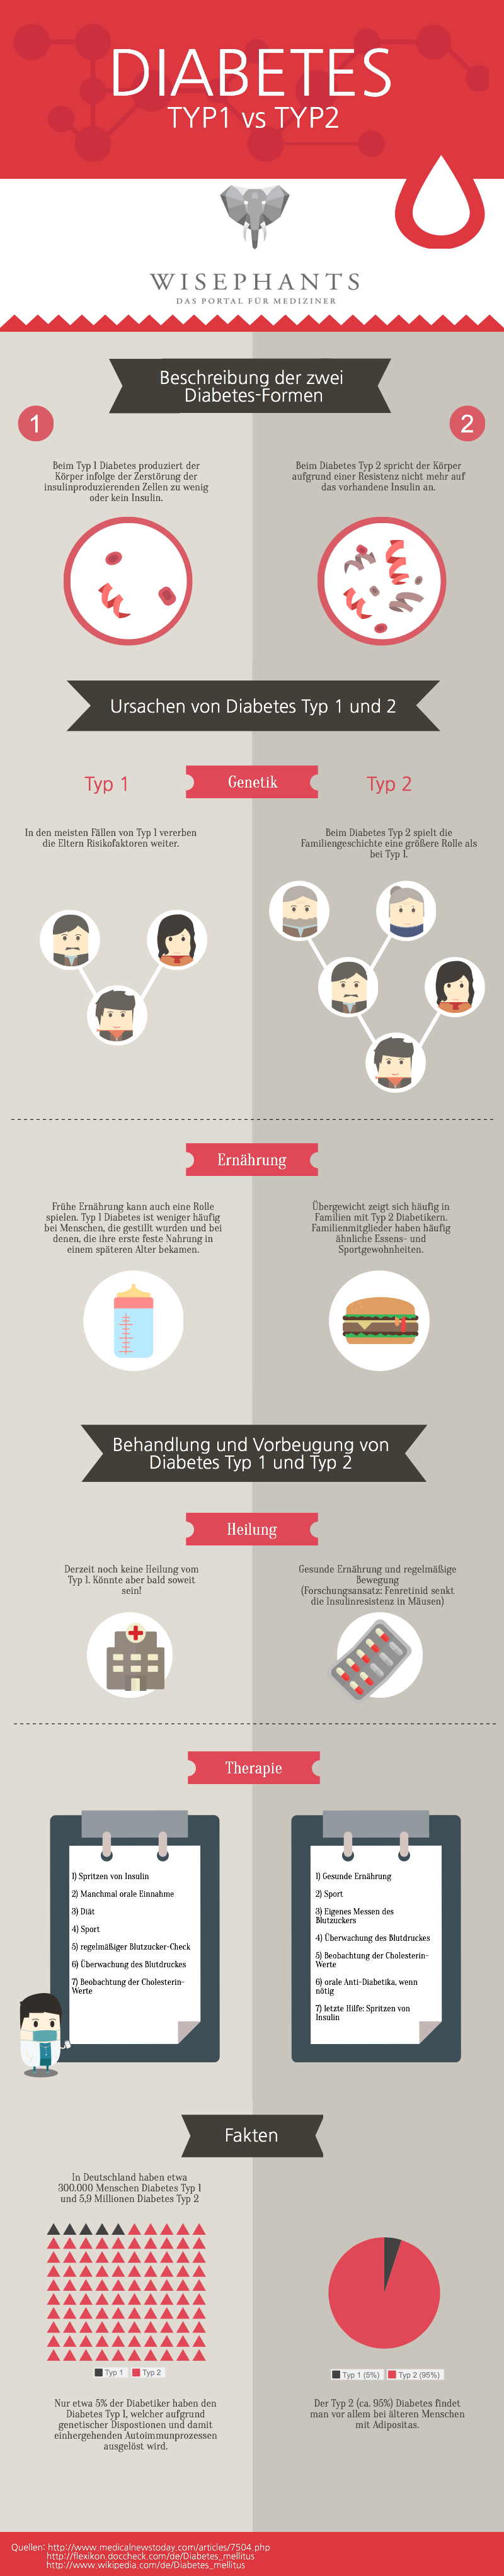 Wisephants Infografik Diabetes Typ 1 und 2